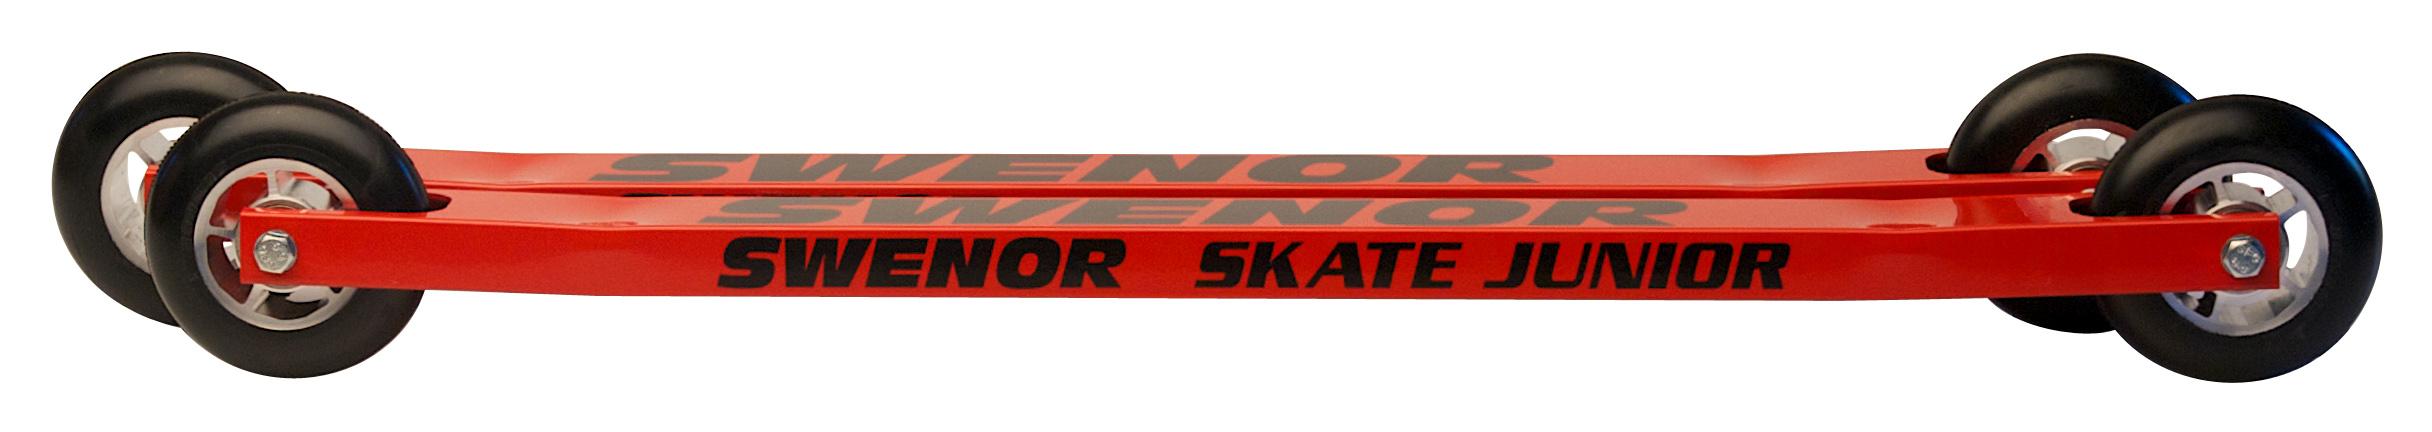 Swenor Skate jr. stamme